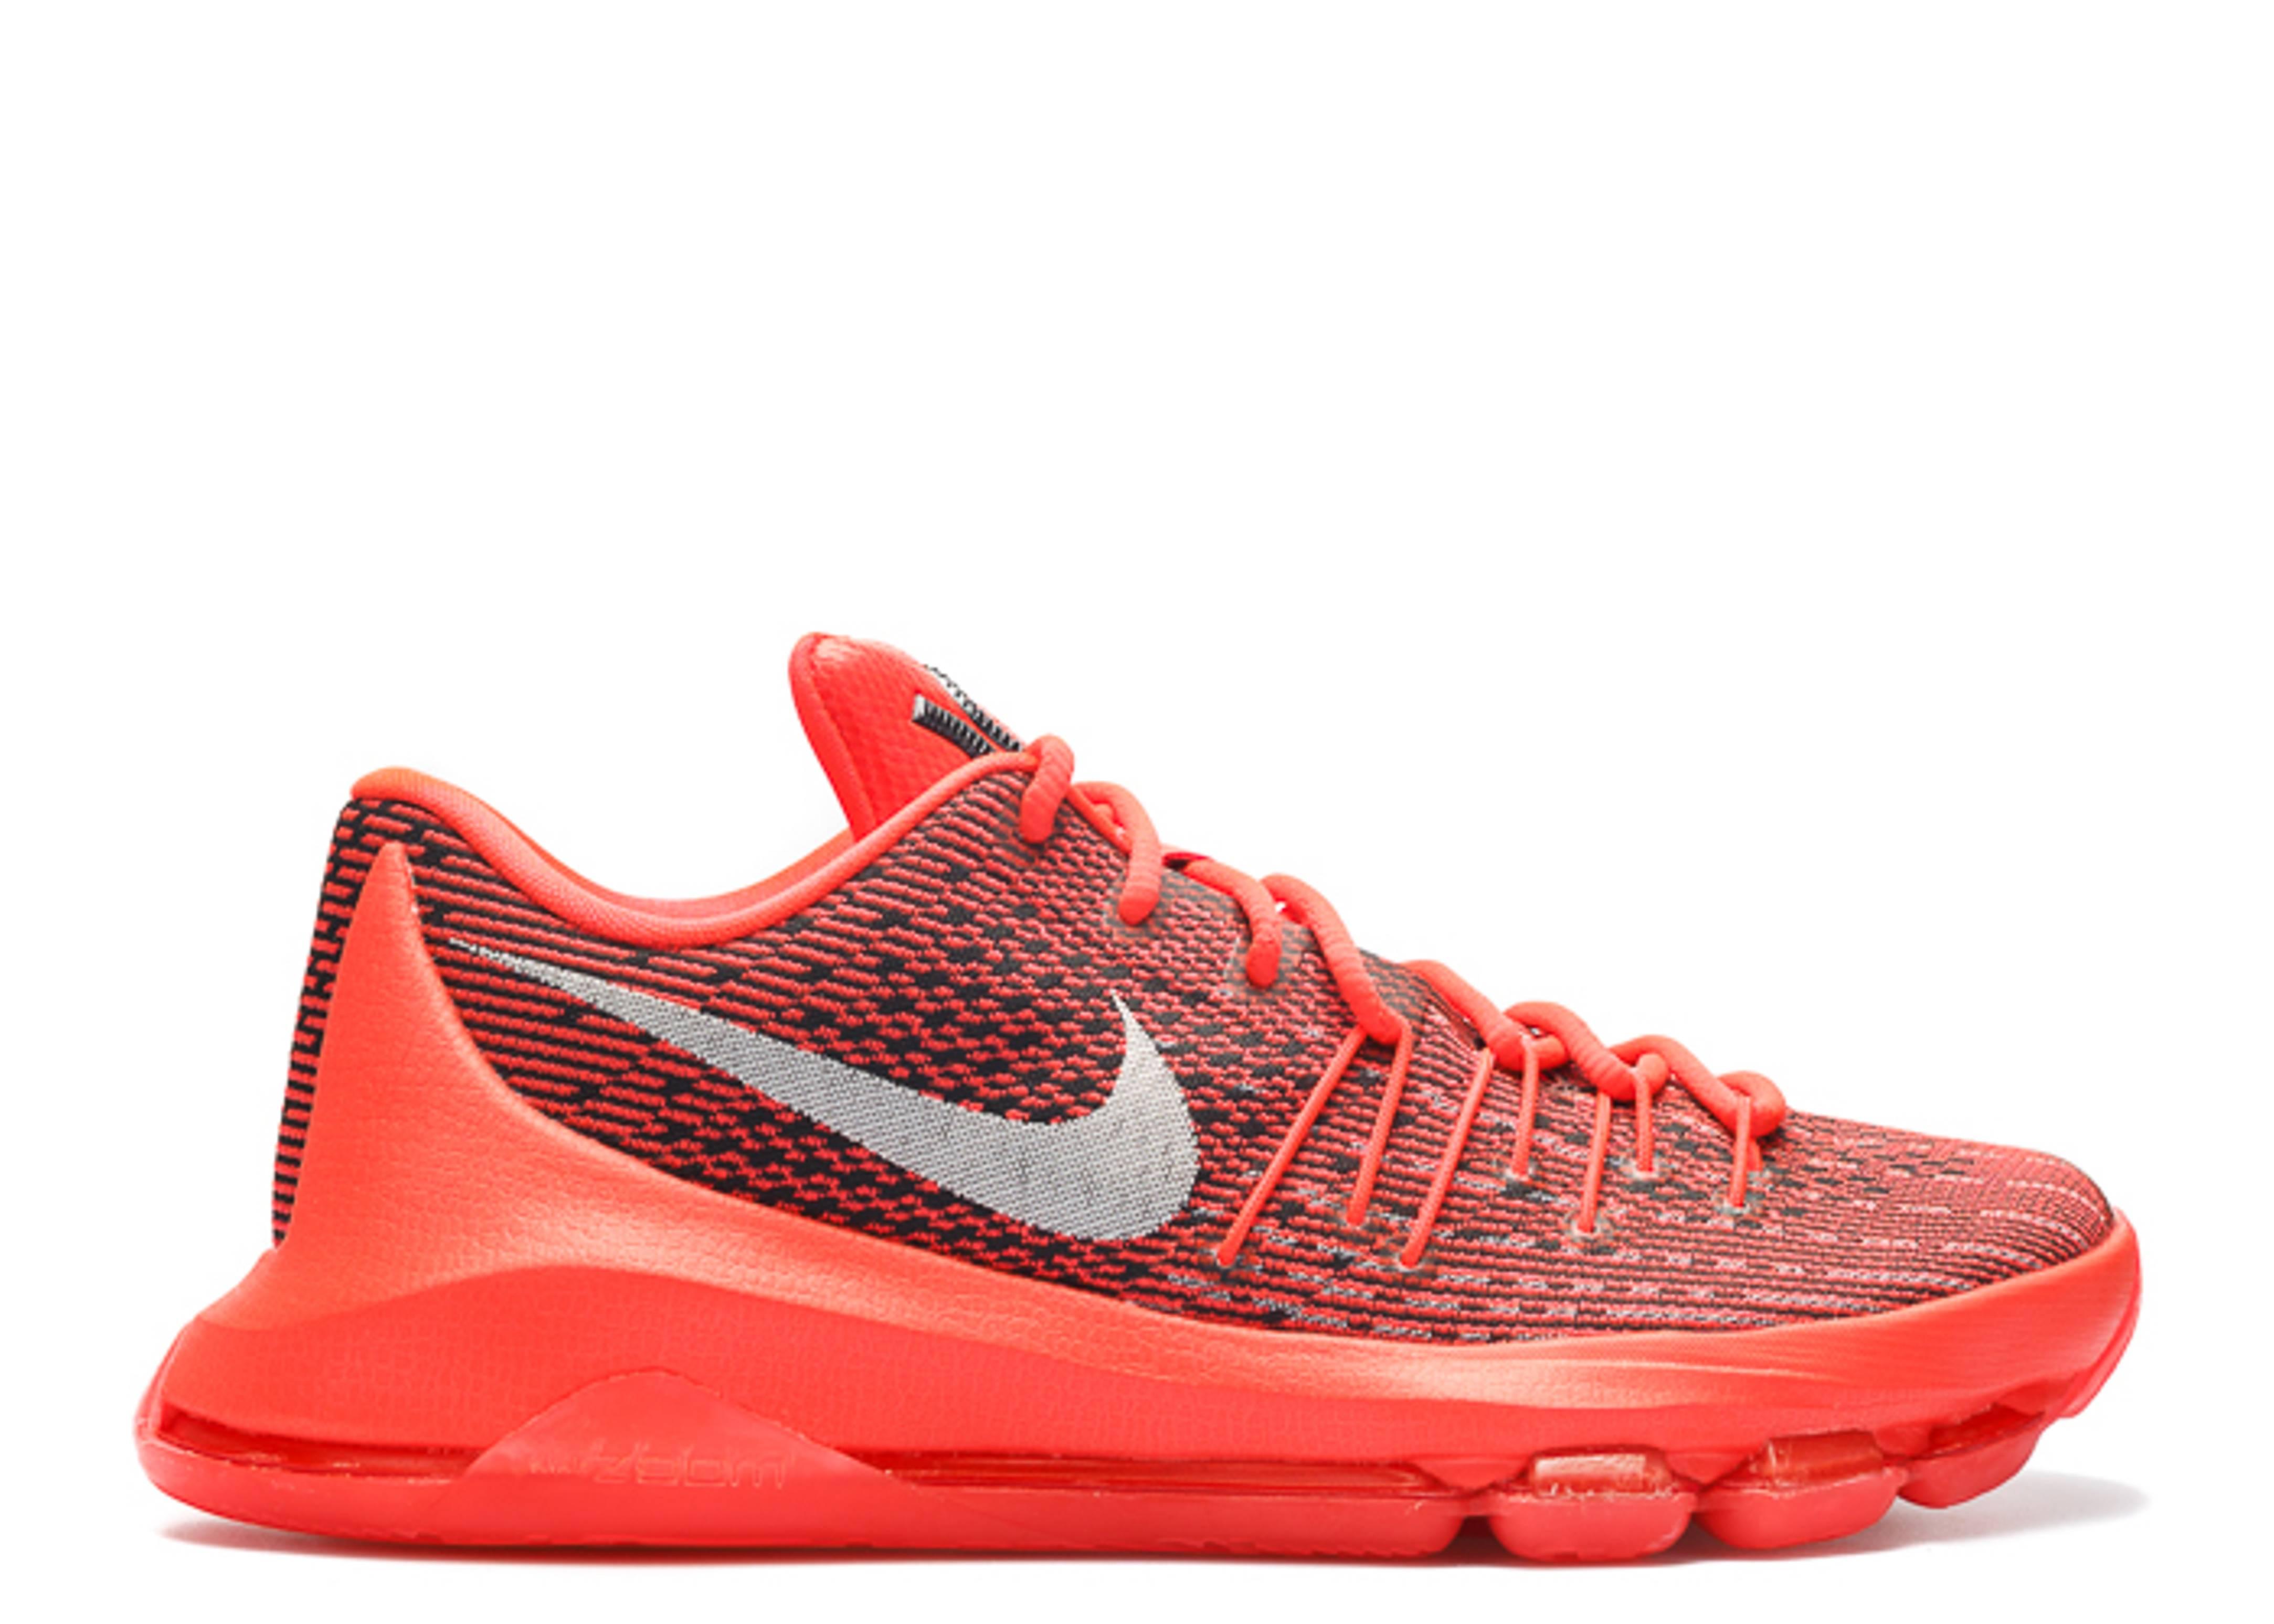 3057605bf2b0 Kevin Durant - Nike Basketball - Nike